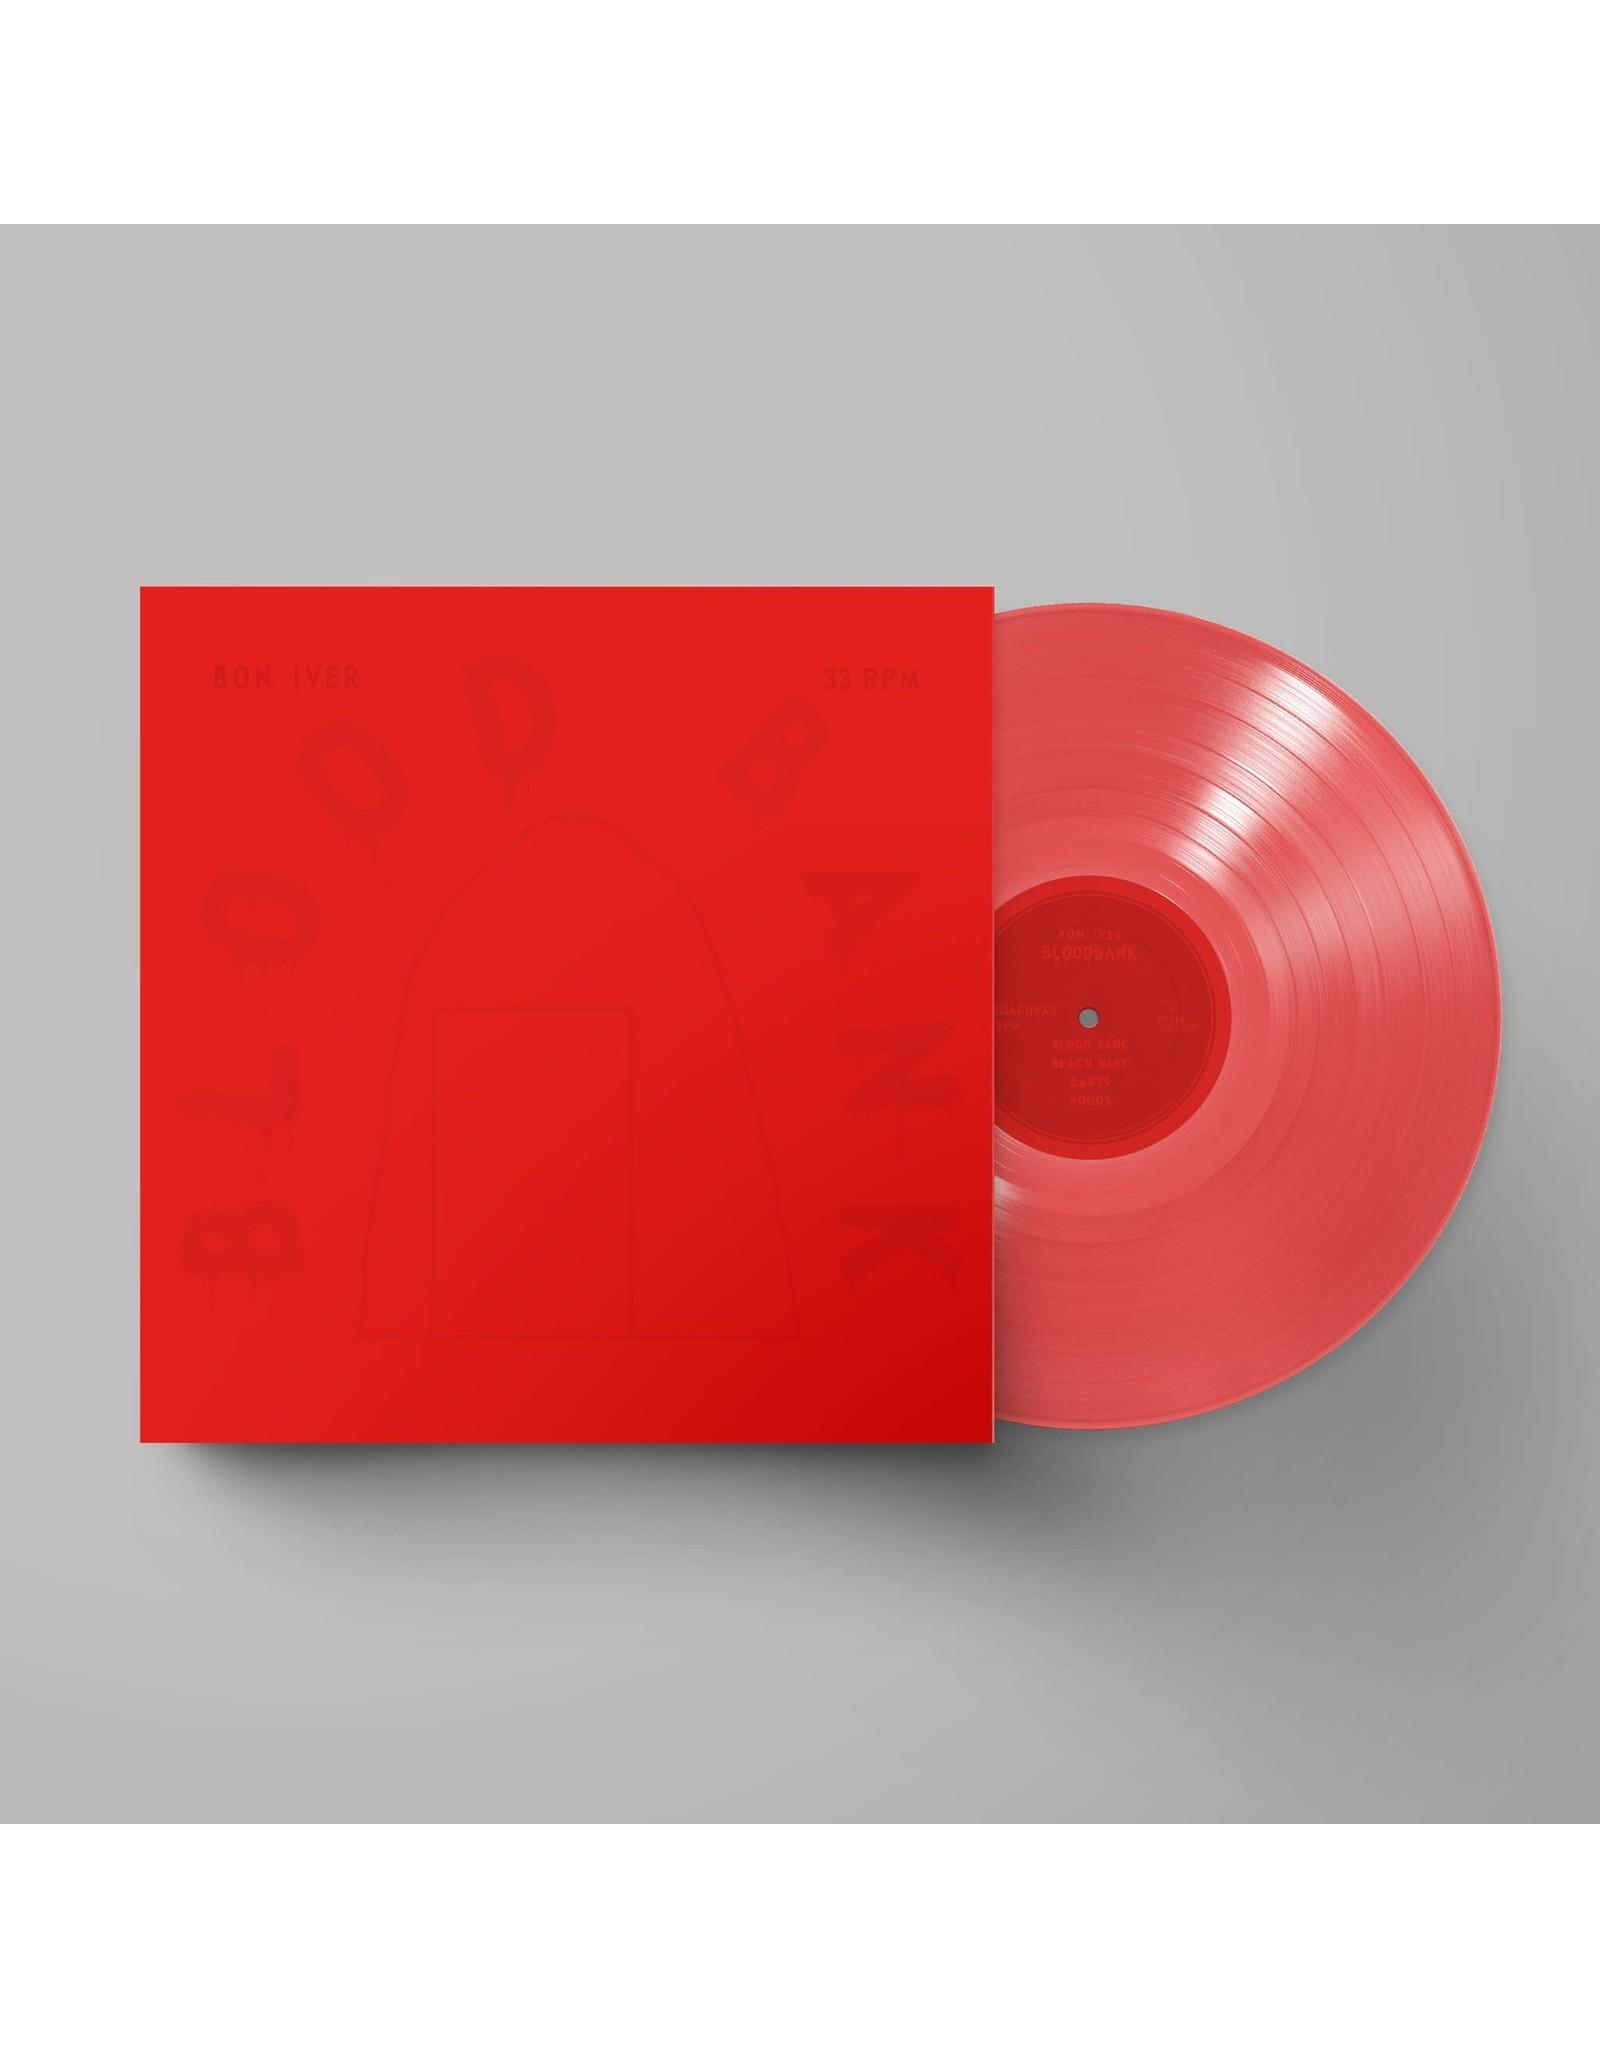 Bon Iver - Blood Bank EP (10th anniversary edition) (red vinyl)